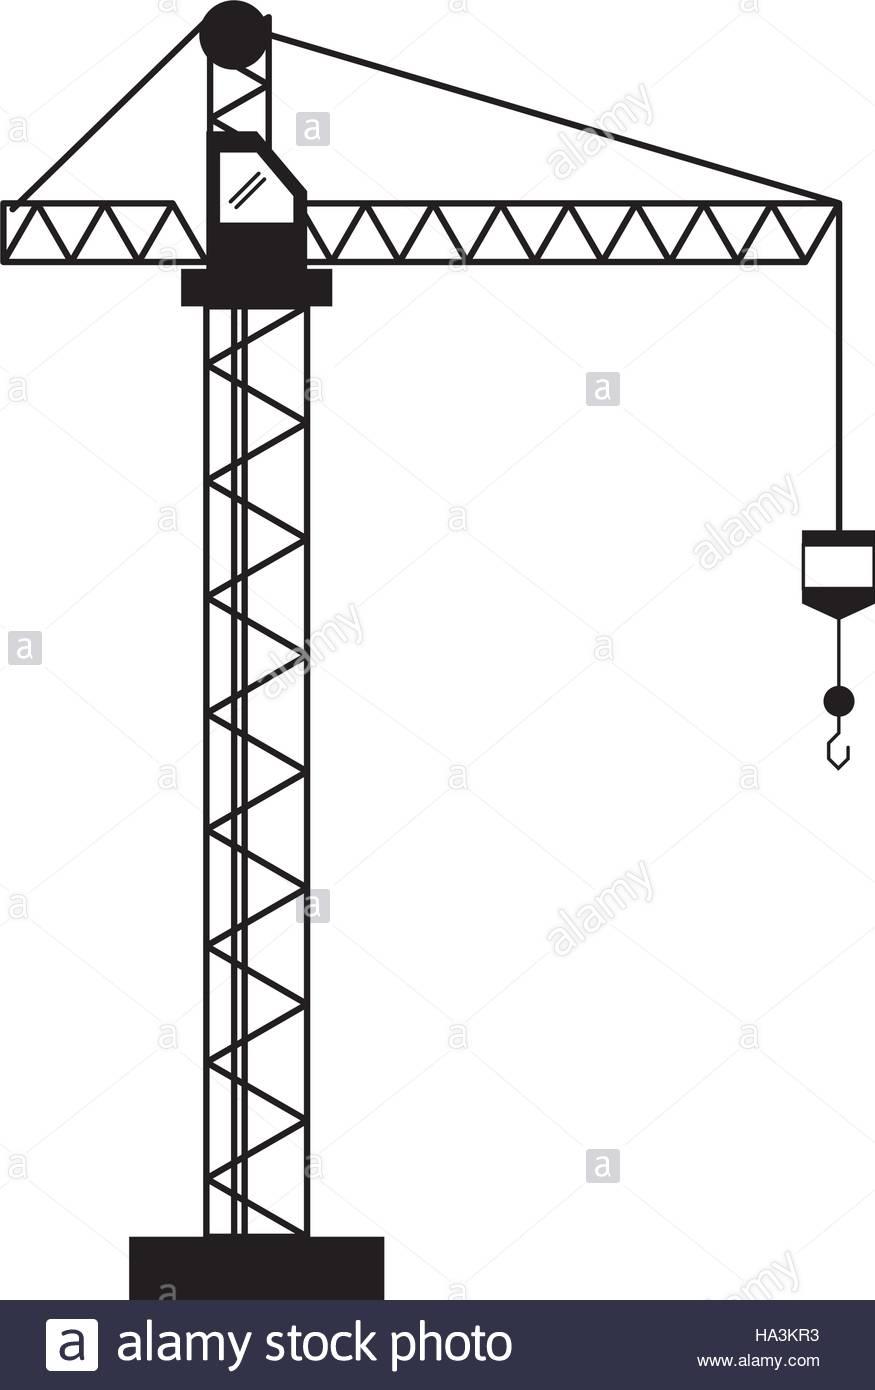 875x1390 Crane Hook Construction Machine Pictogram Stock Vector Art